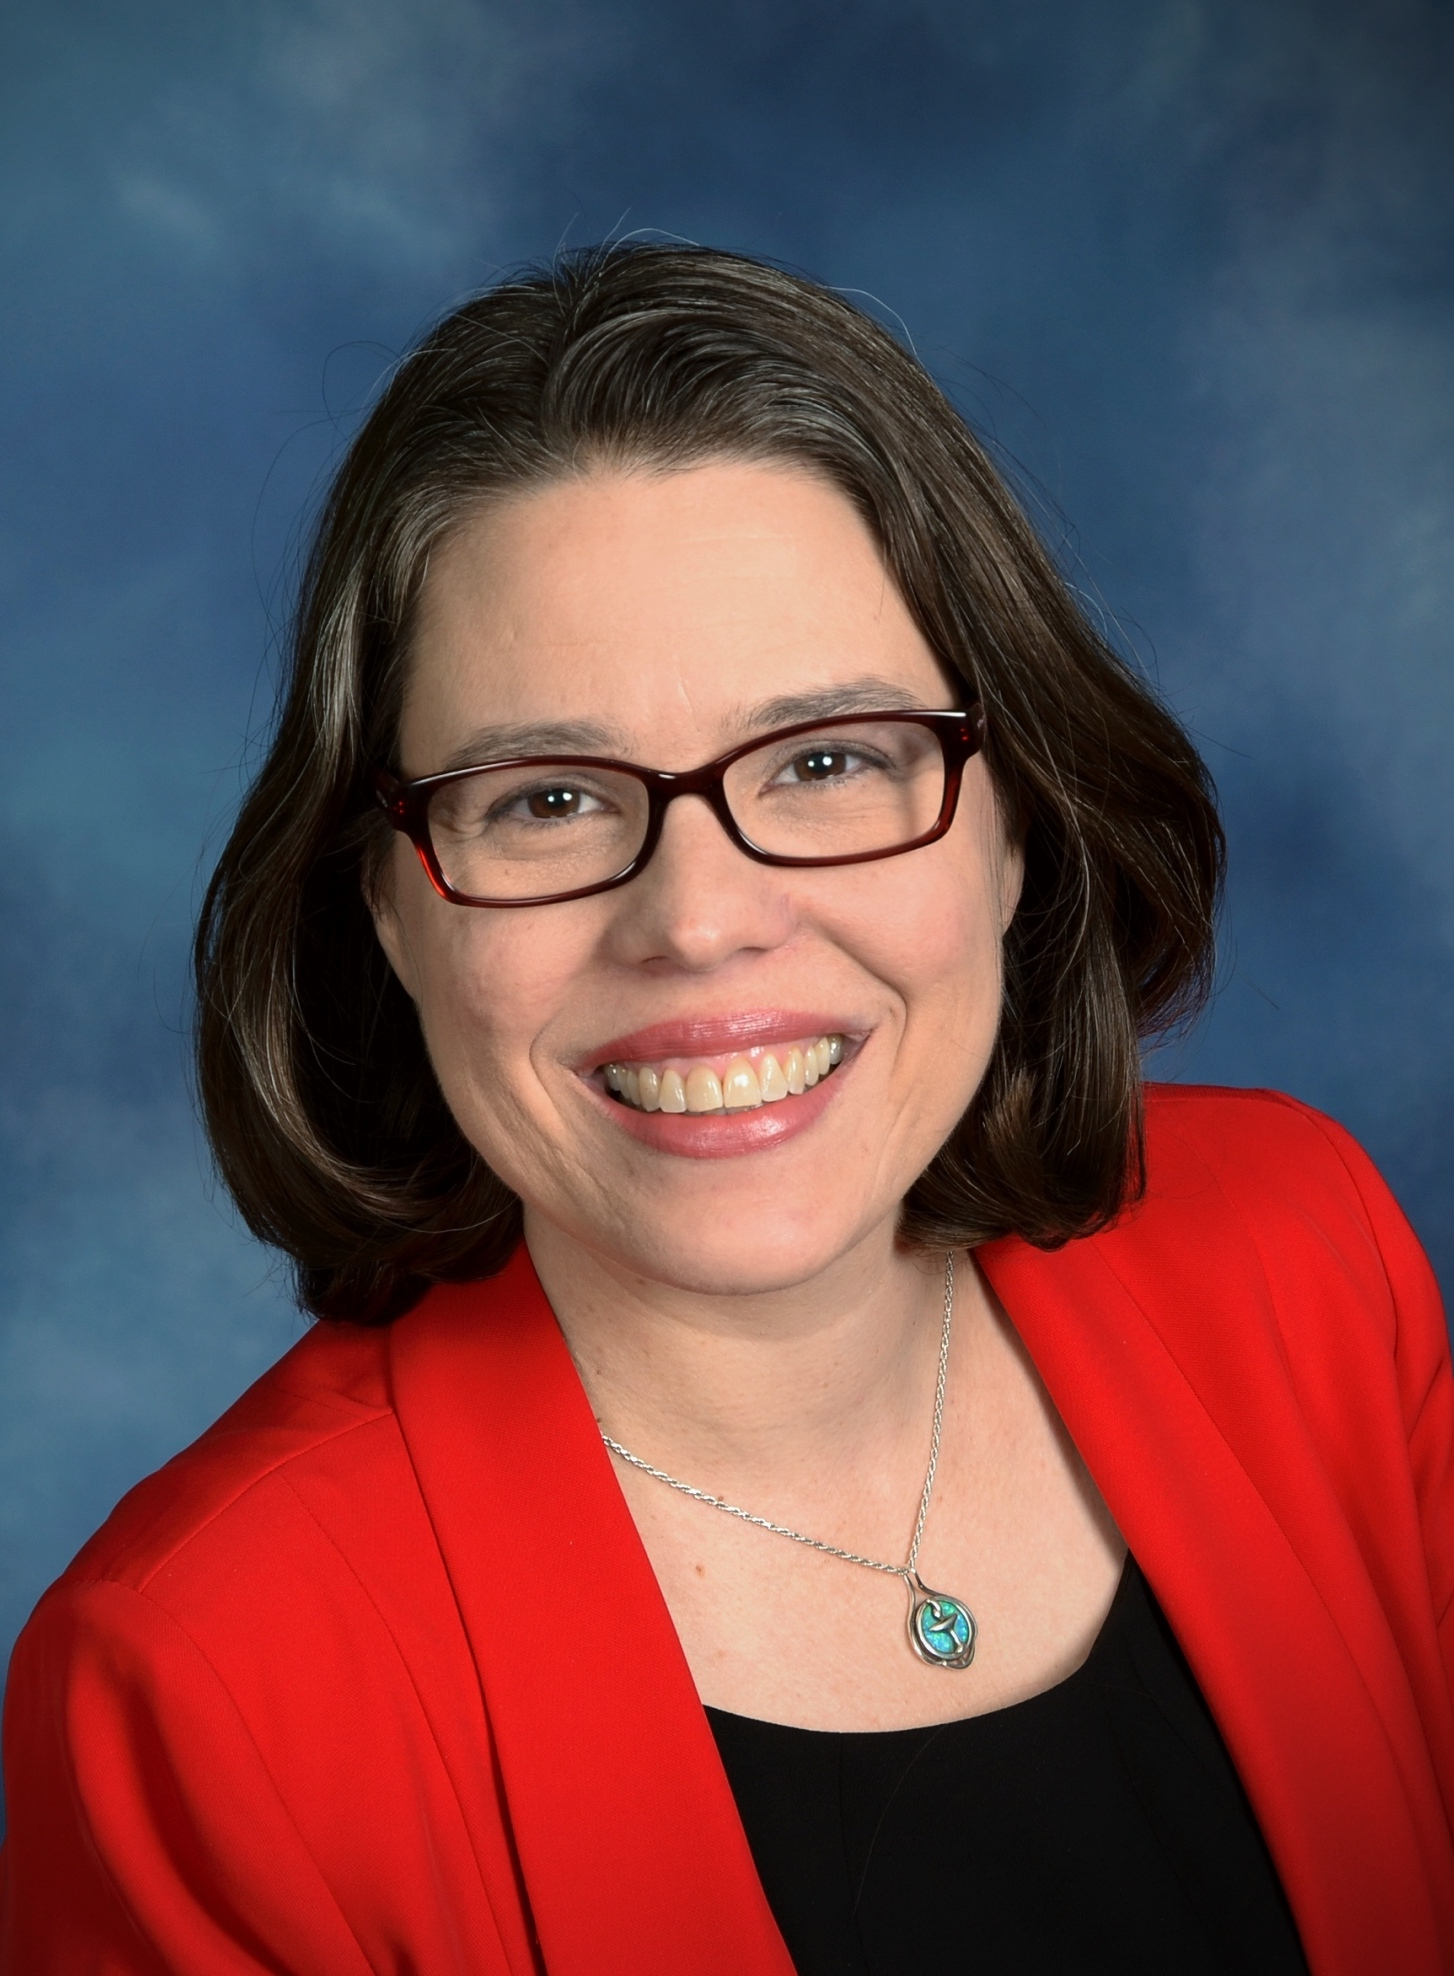 Susan Frederick-Gray